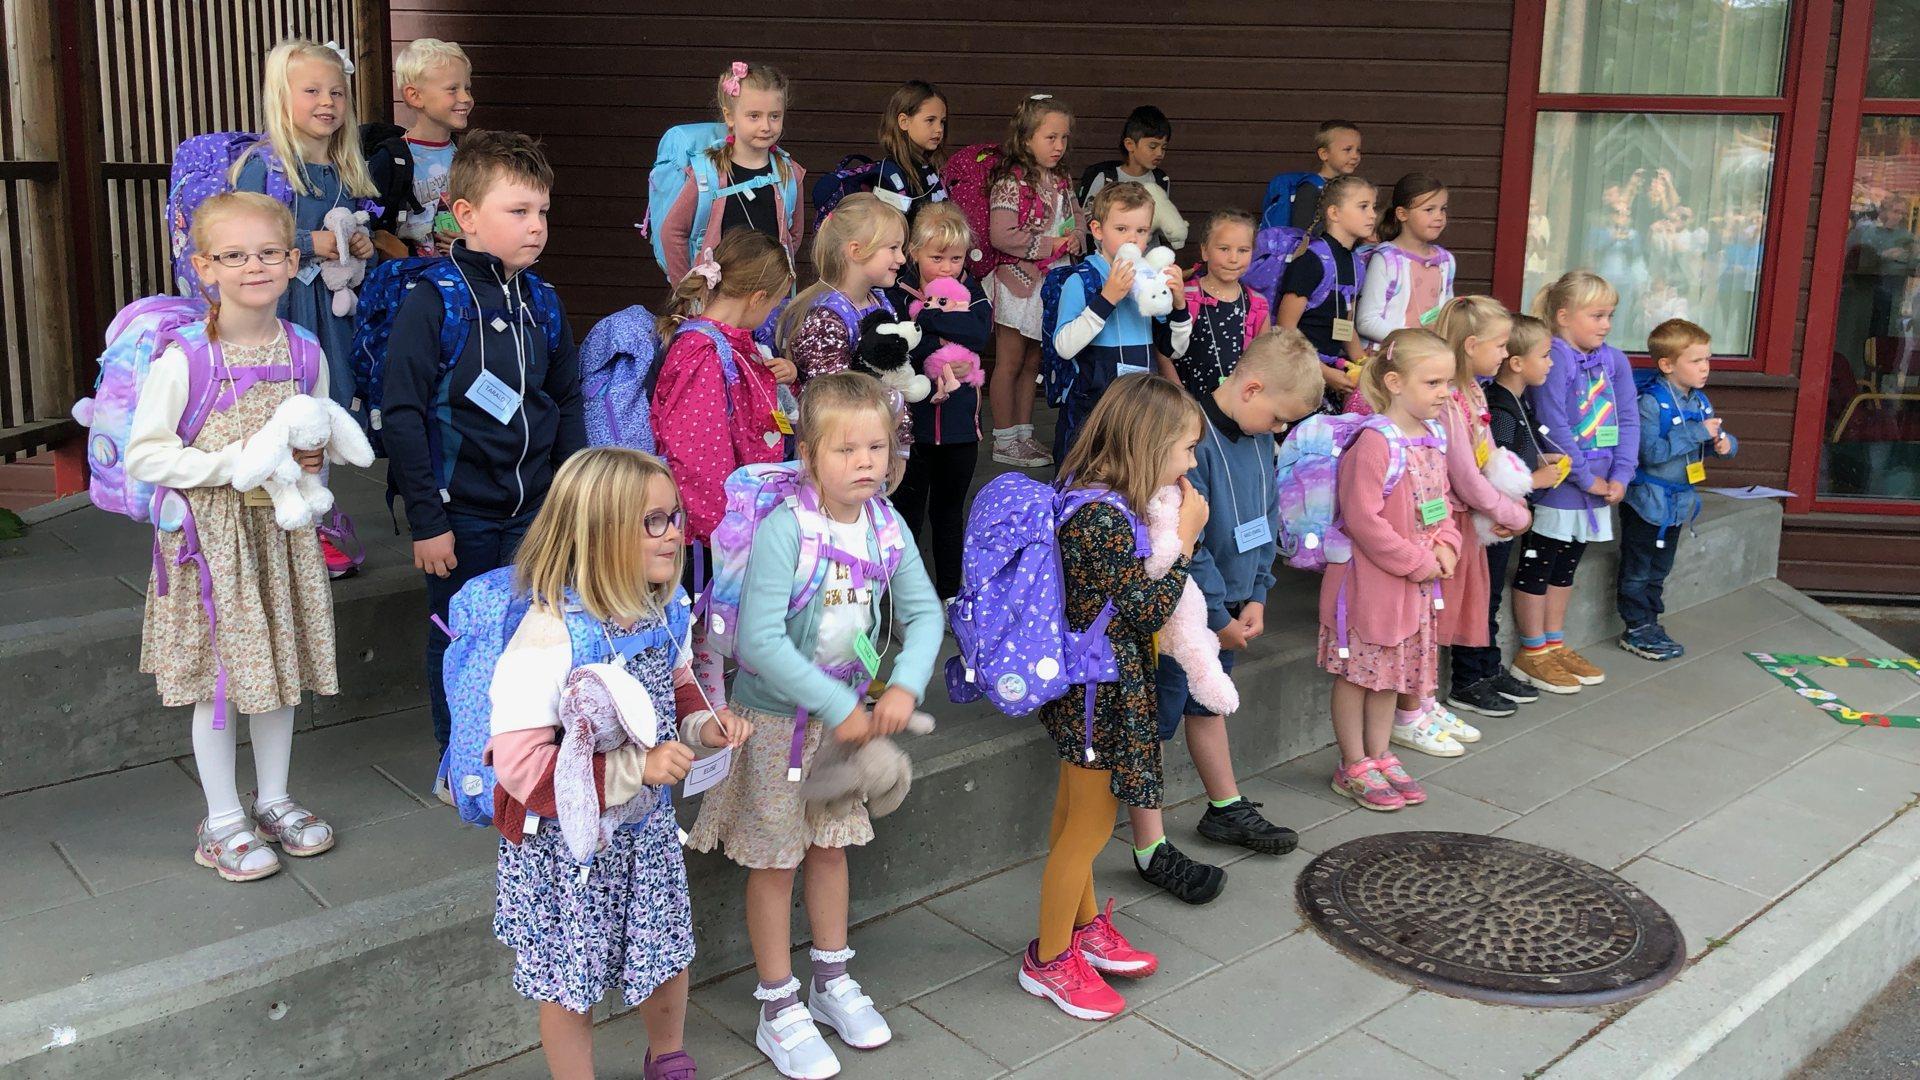 27 førsteklassinger på Sysle skole